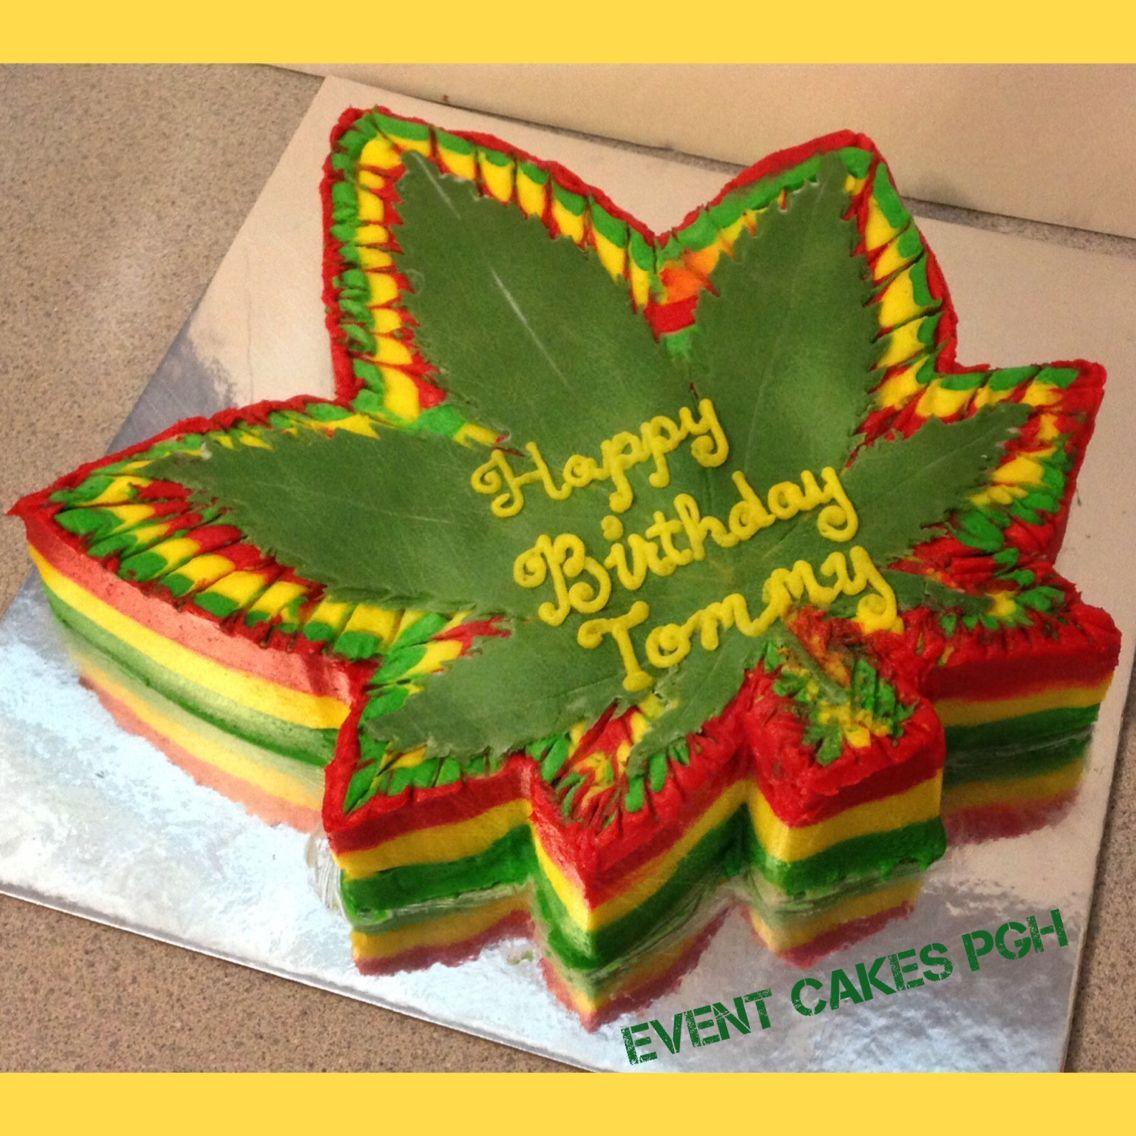 Pleasant 20 Beautiful Photo Of Happy Birthday Bob Cake Cake Bob Marley Funny Birthday Cards Online Elaedamsfinfo